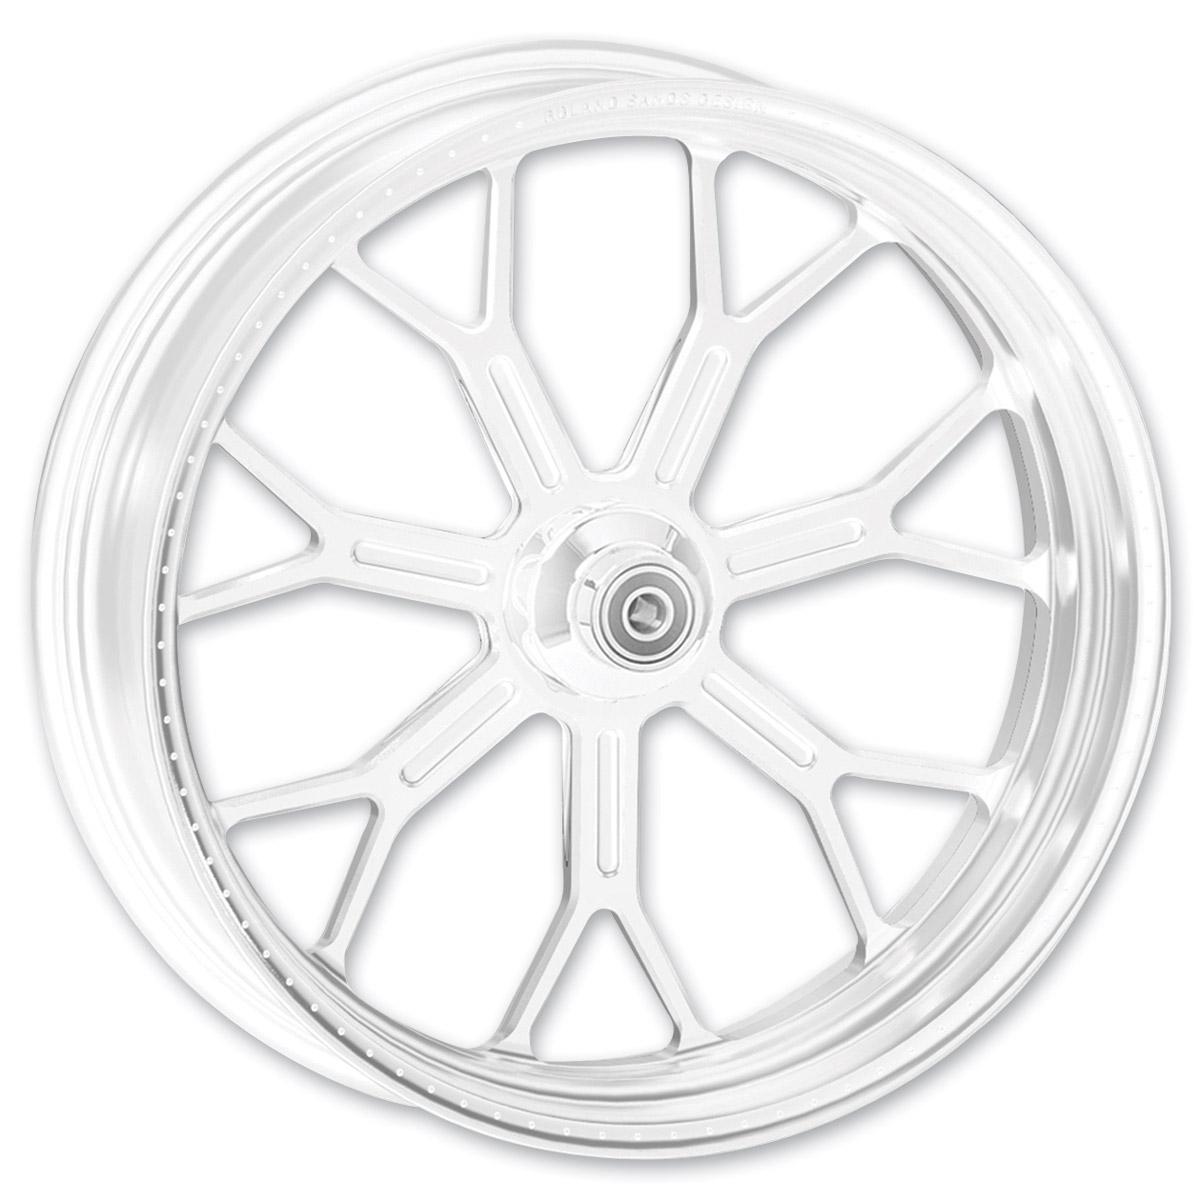 Roland Sands Design Del Mar Chrome Rear Wheel, 18